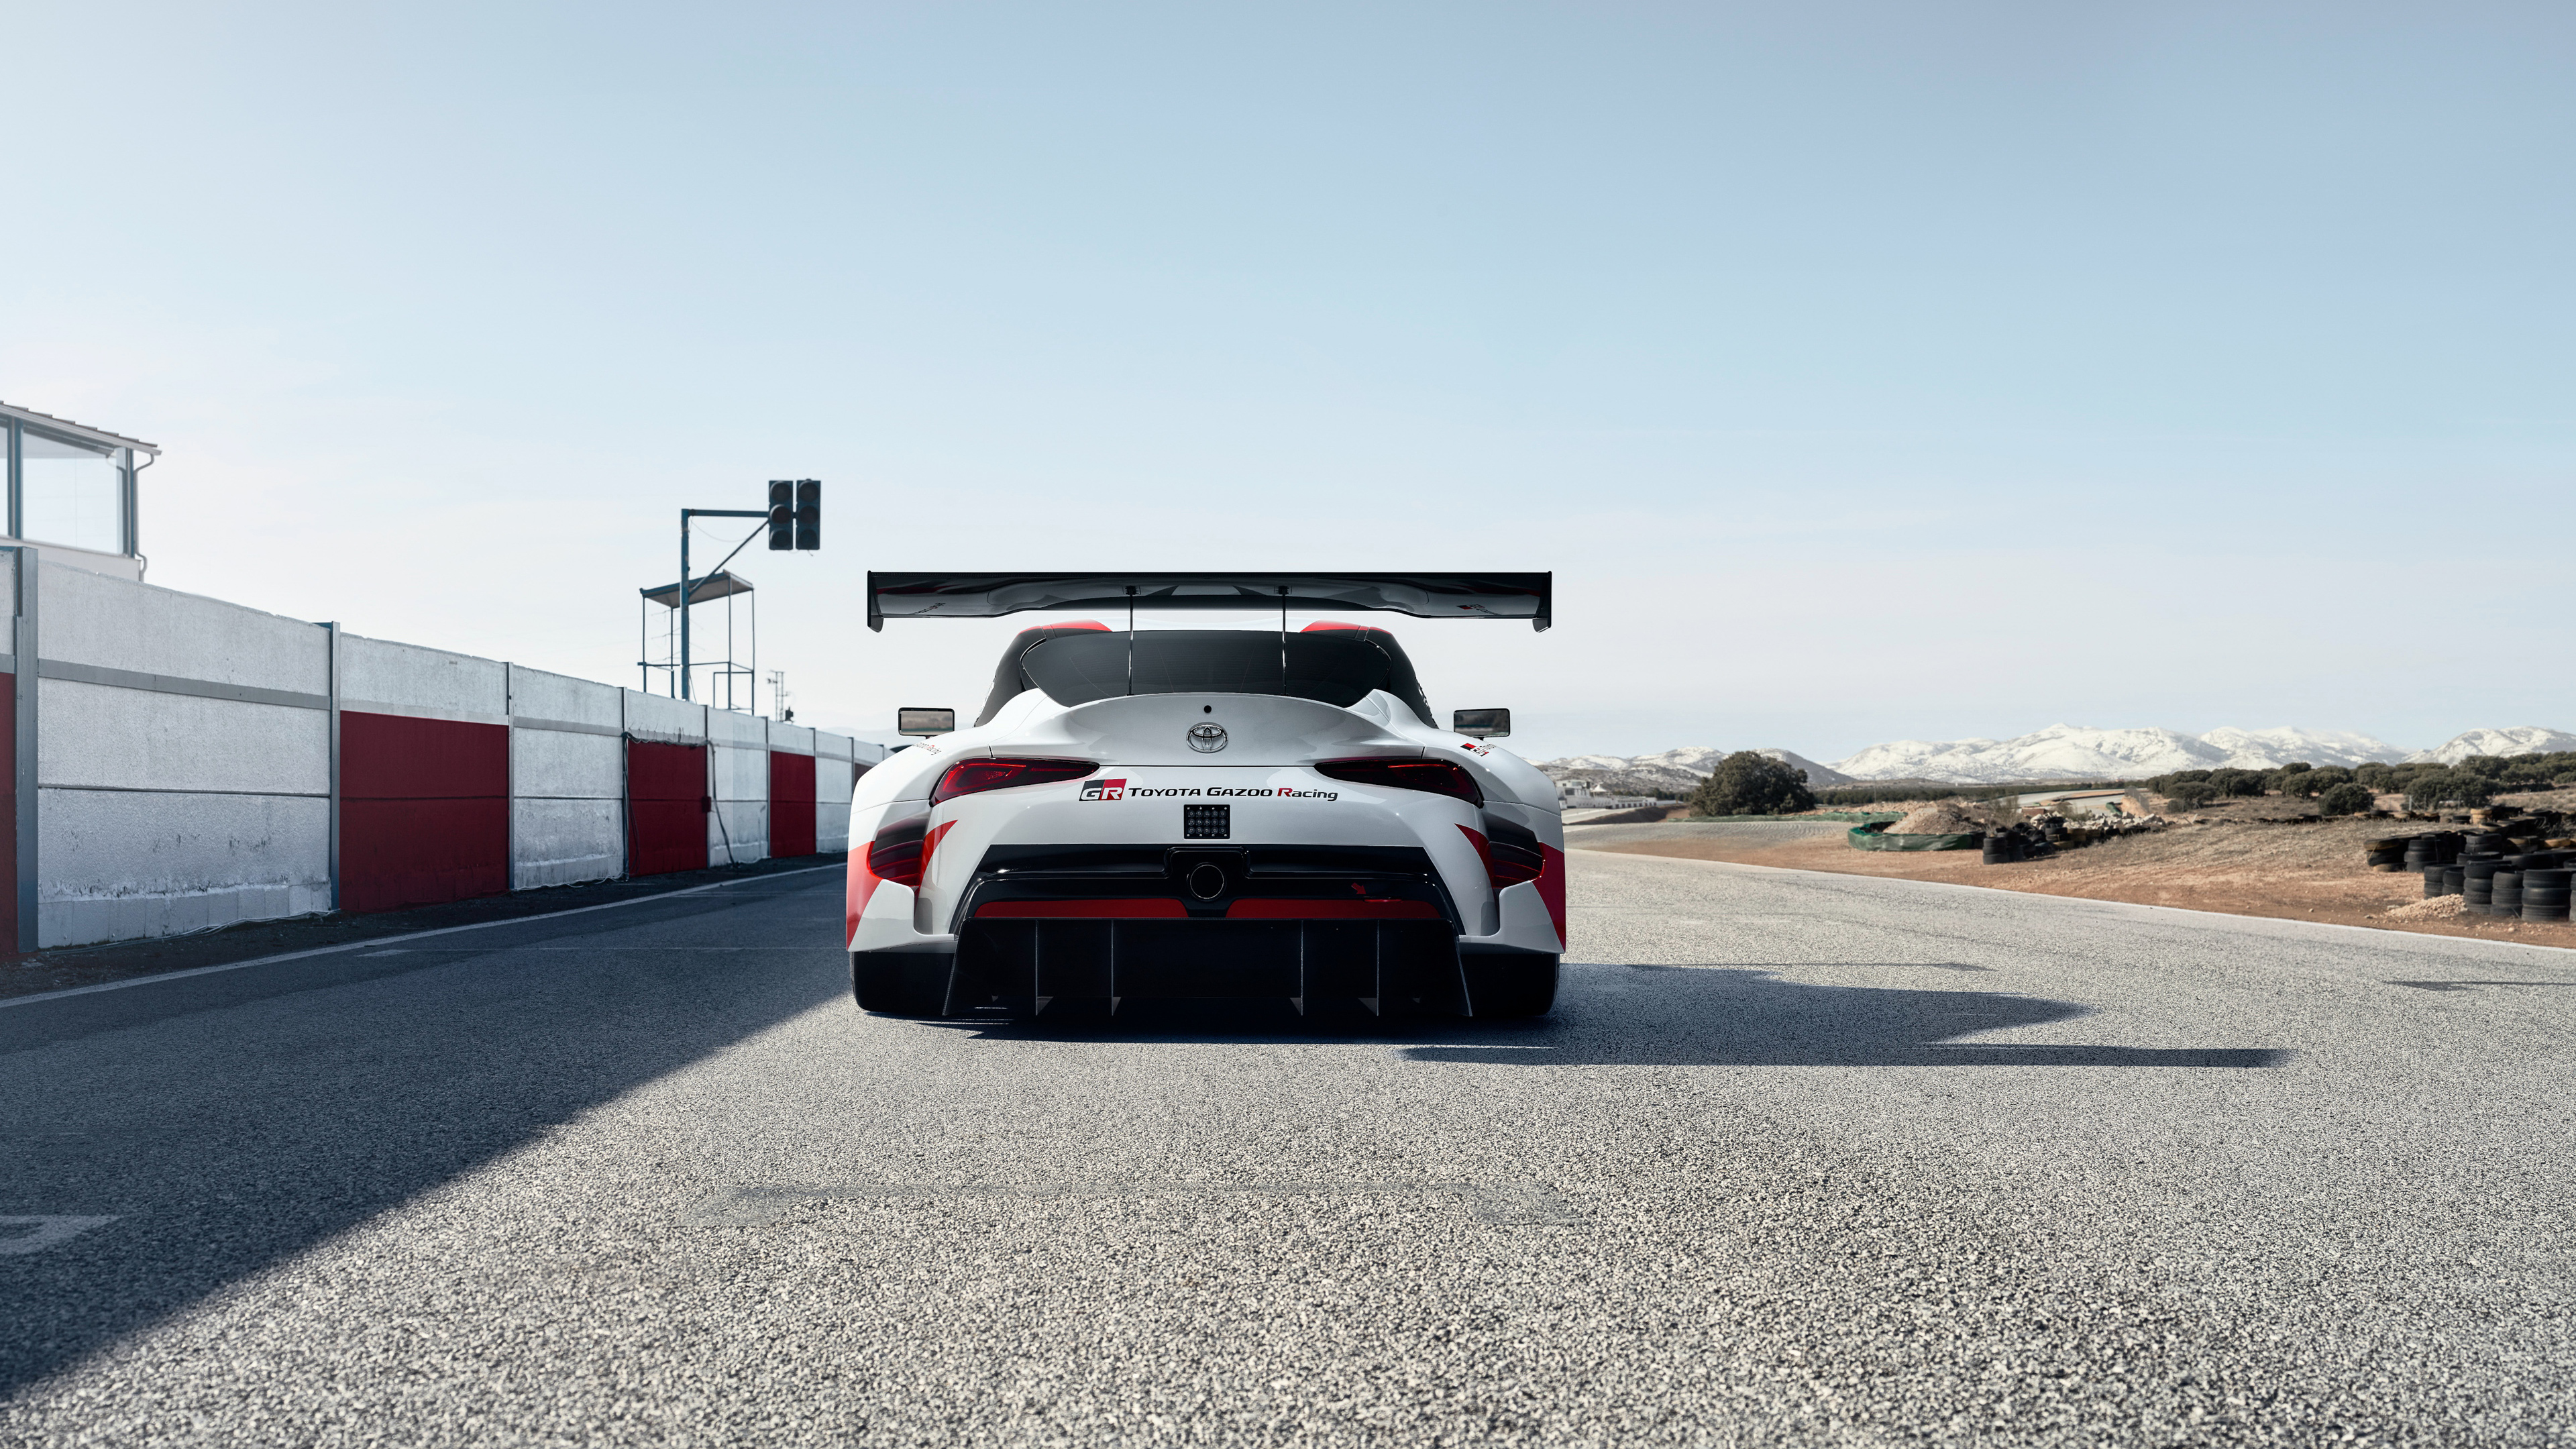 2018 Toyota GR Supra Racing Concept 4K 7 Wallpaper